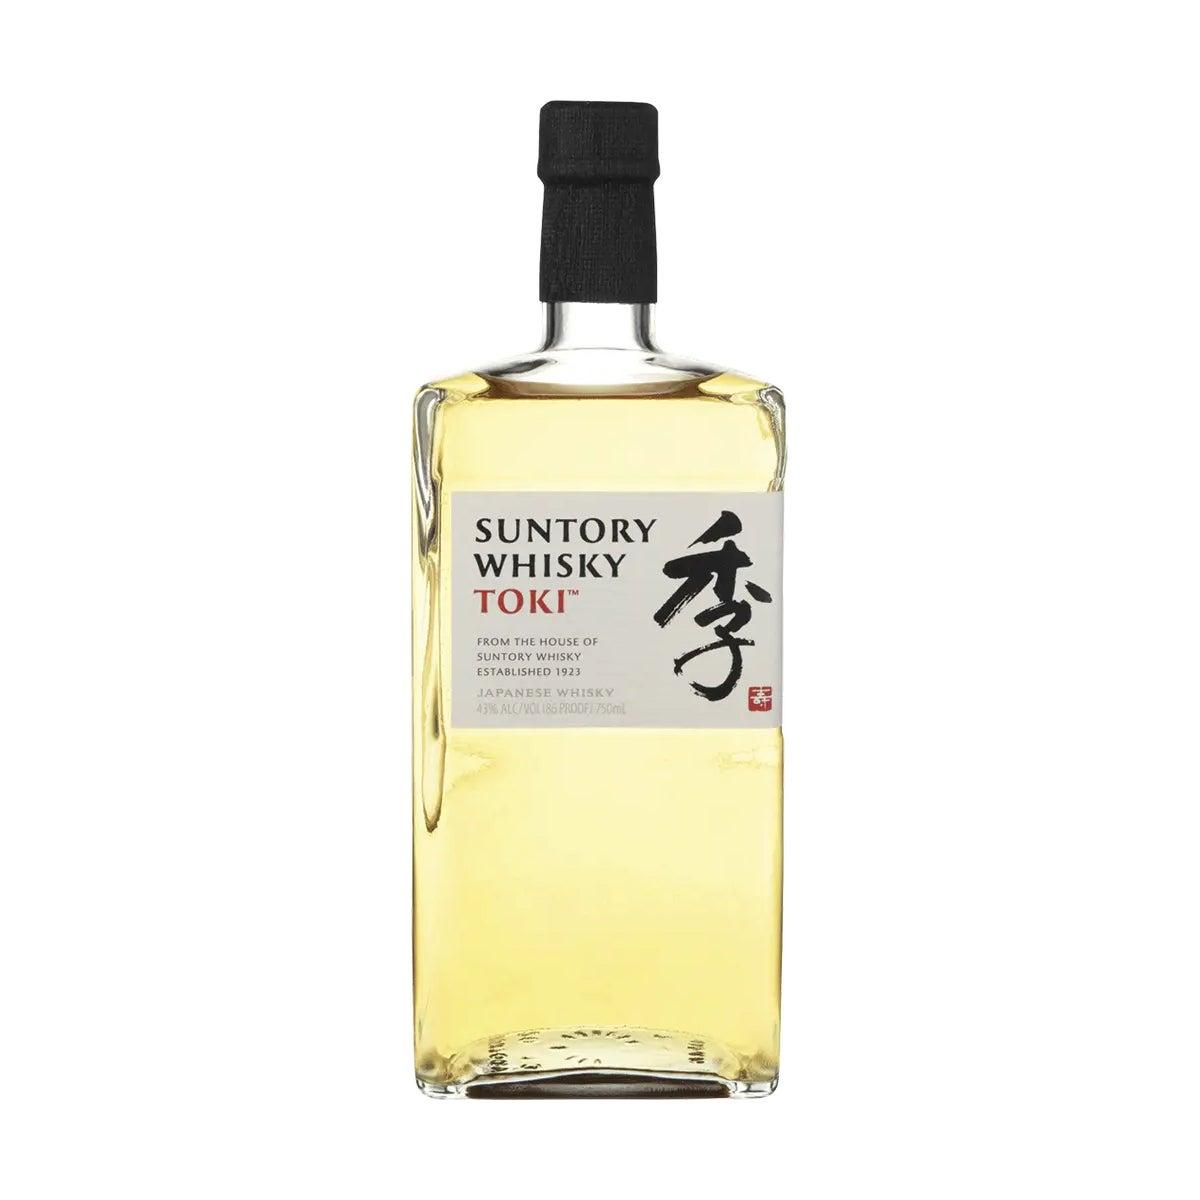 Best Japanese Whiskies Option Suntory Whisky Toki